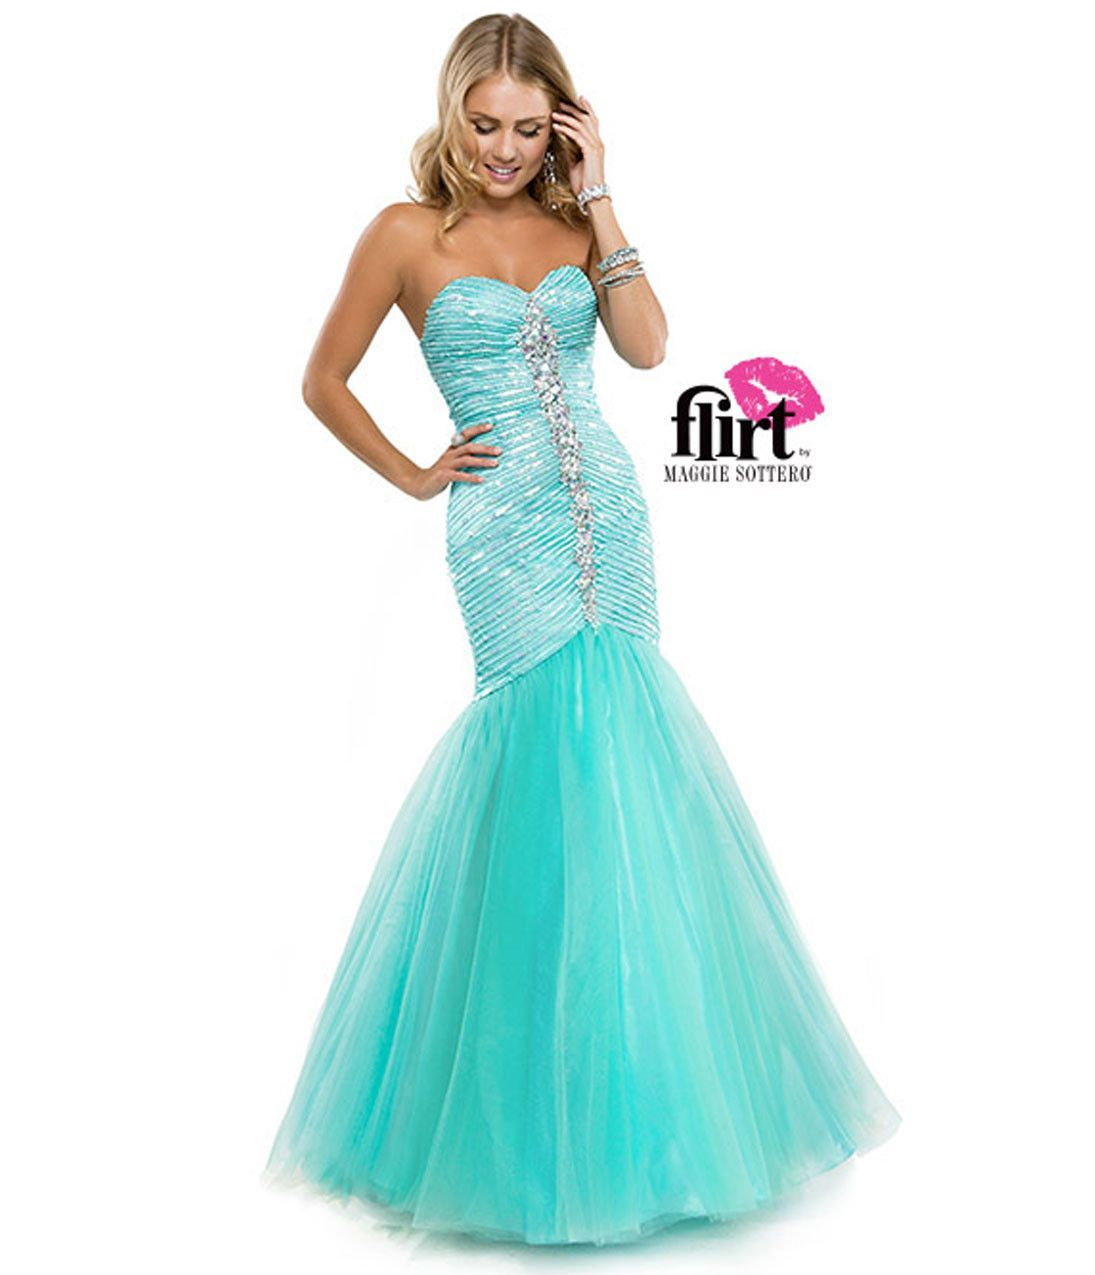 Flirt by Maggie Sottero P5808 Aqua Size 2 mermaid strapless prom ...